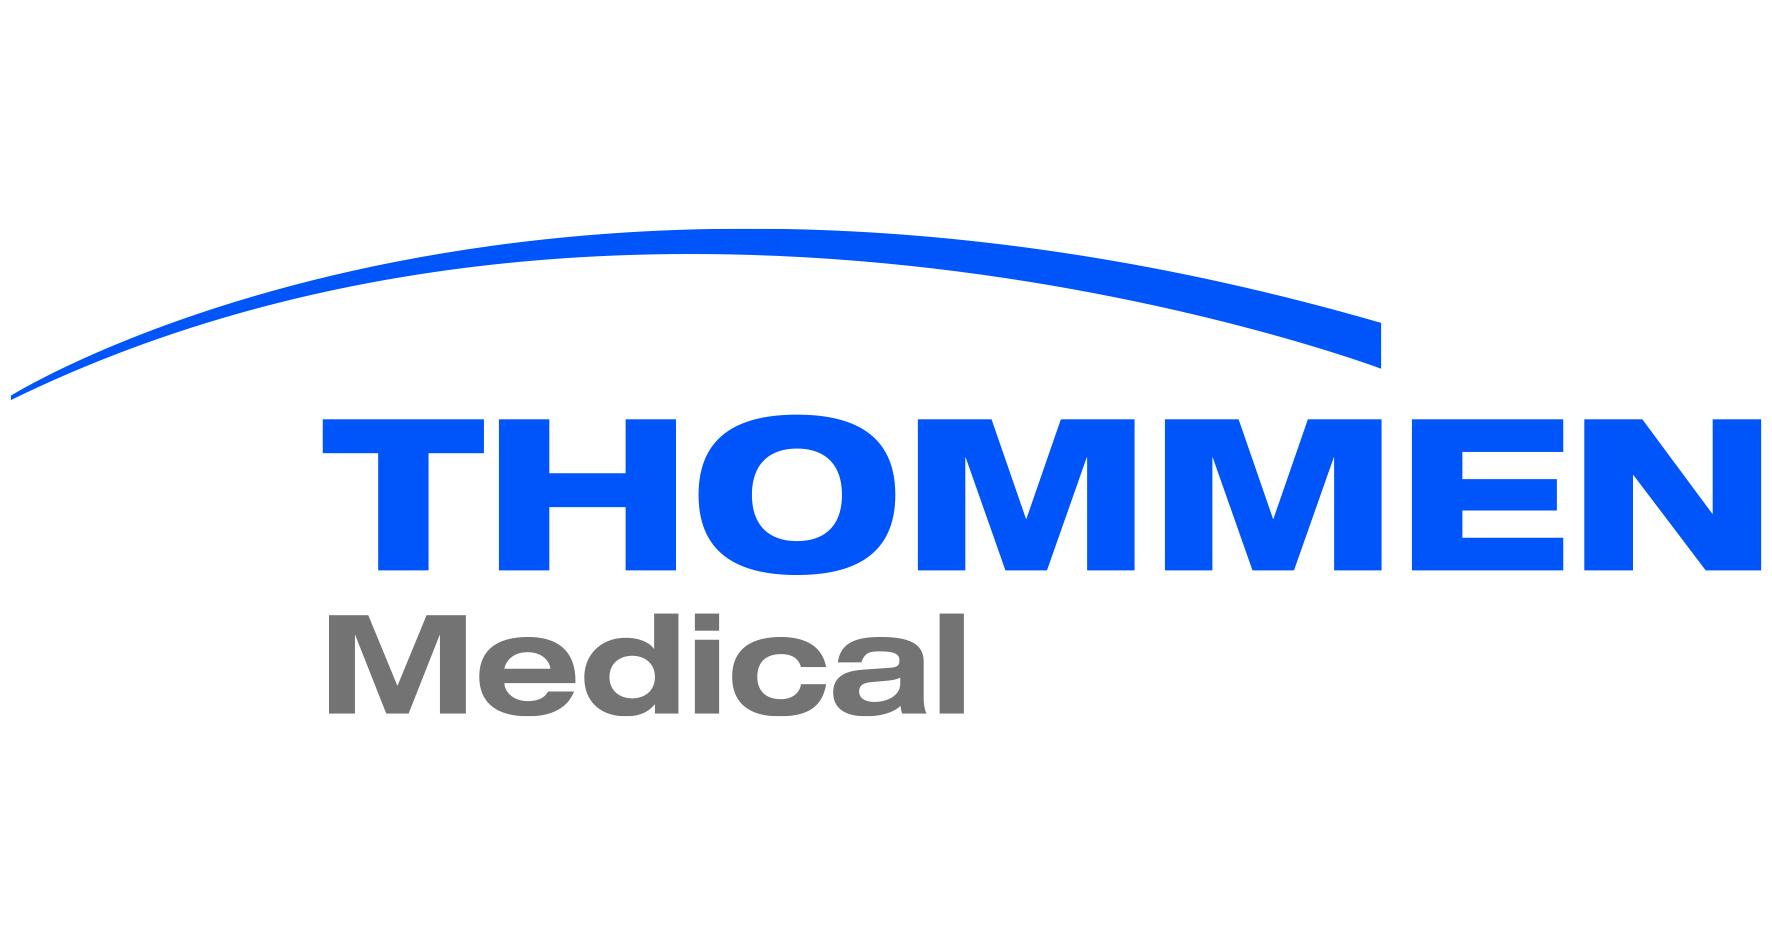 Thommen Medical - the dedicated dental implant experts